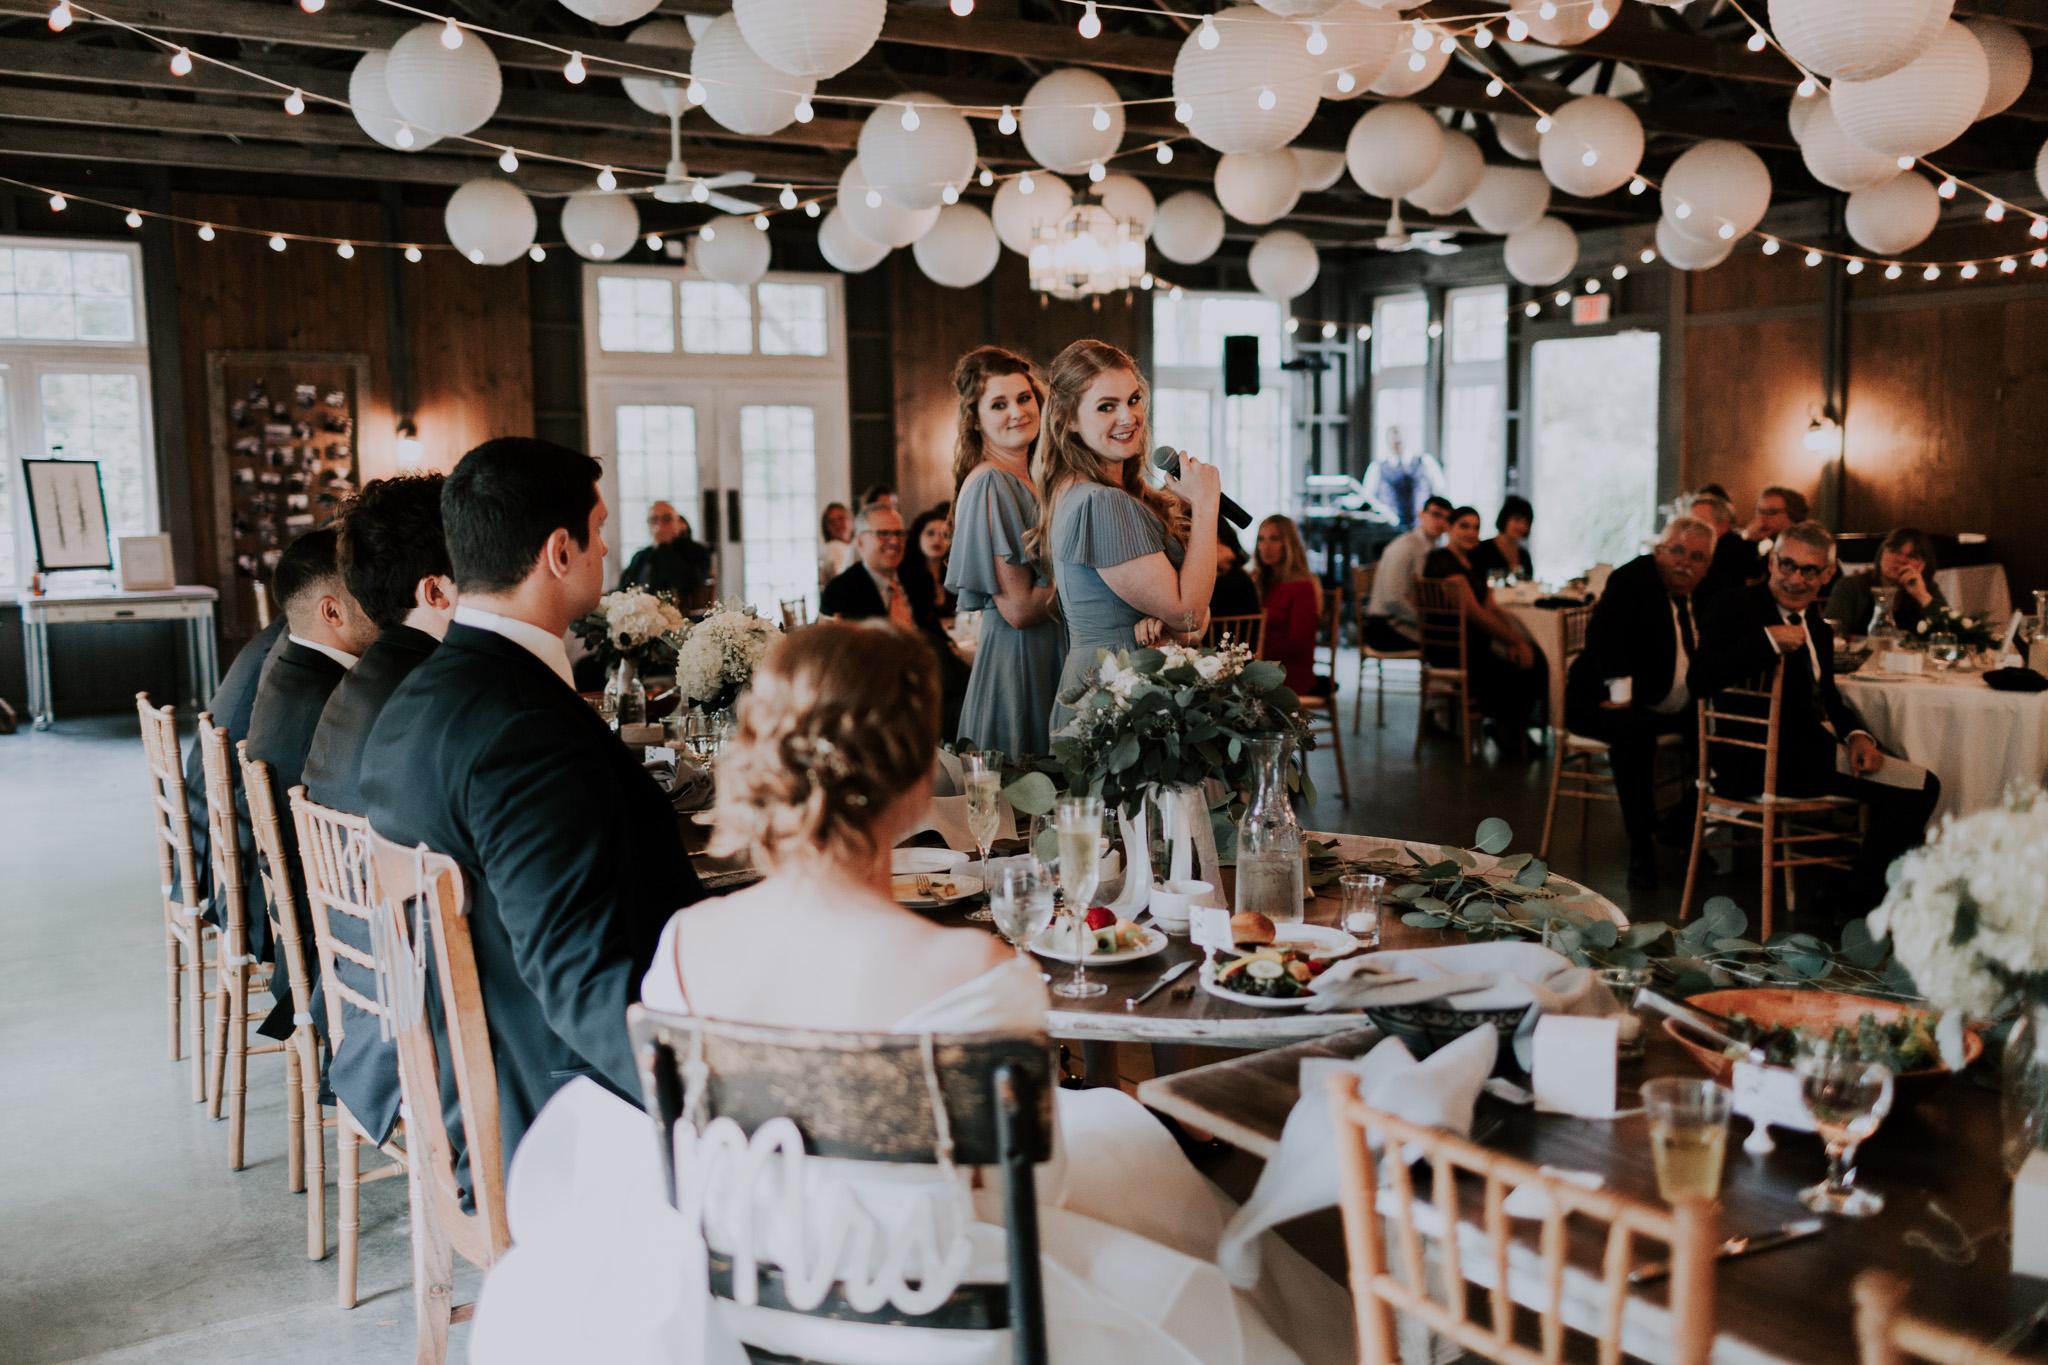 MillCreek-Wilde-Wedding-Barn-Michigan-Eliza-Eric-Vafa-Photo976.jpg